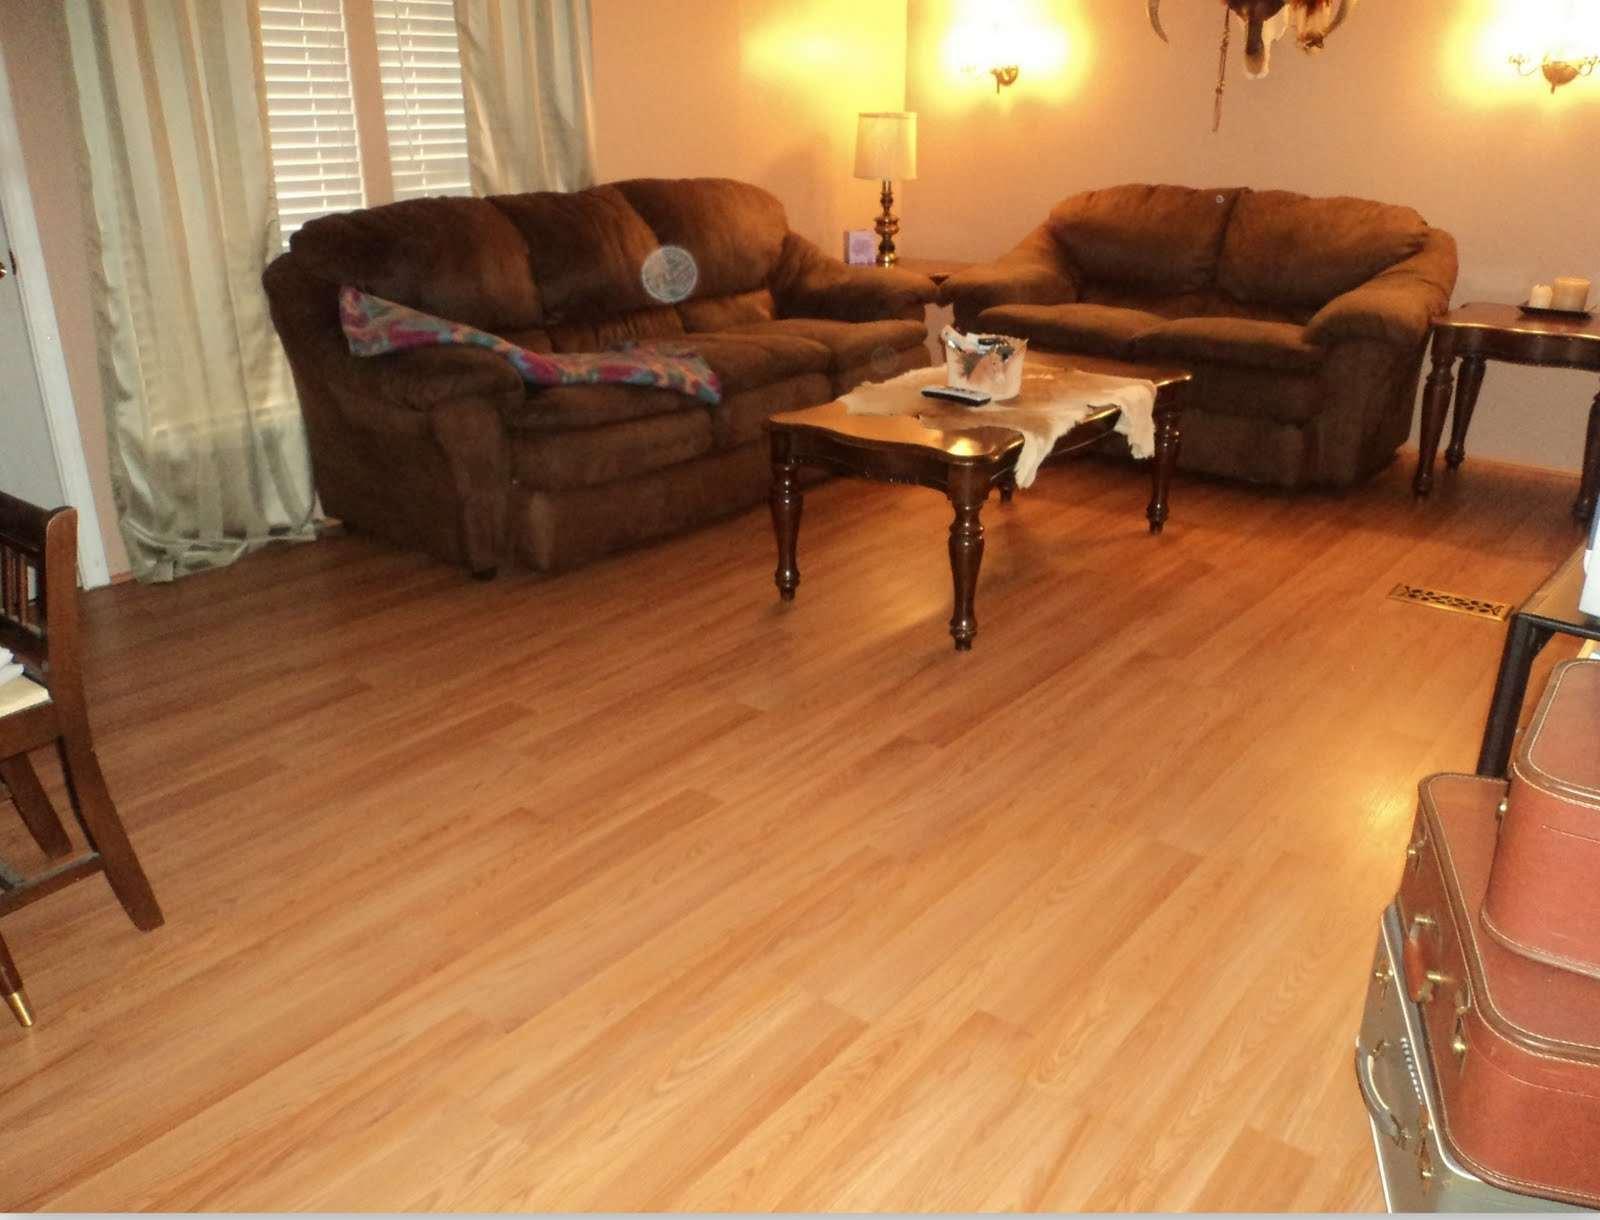 Living Room Decorating Design Flooring Ideas Plans House Plans 54029